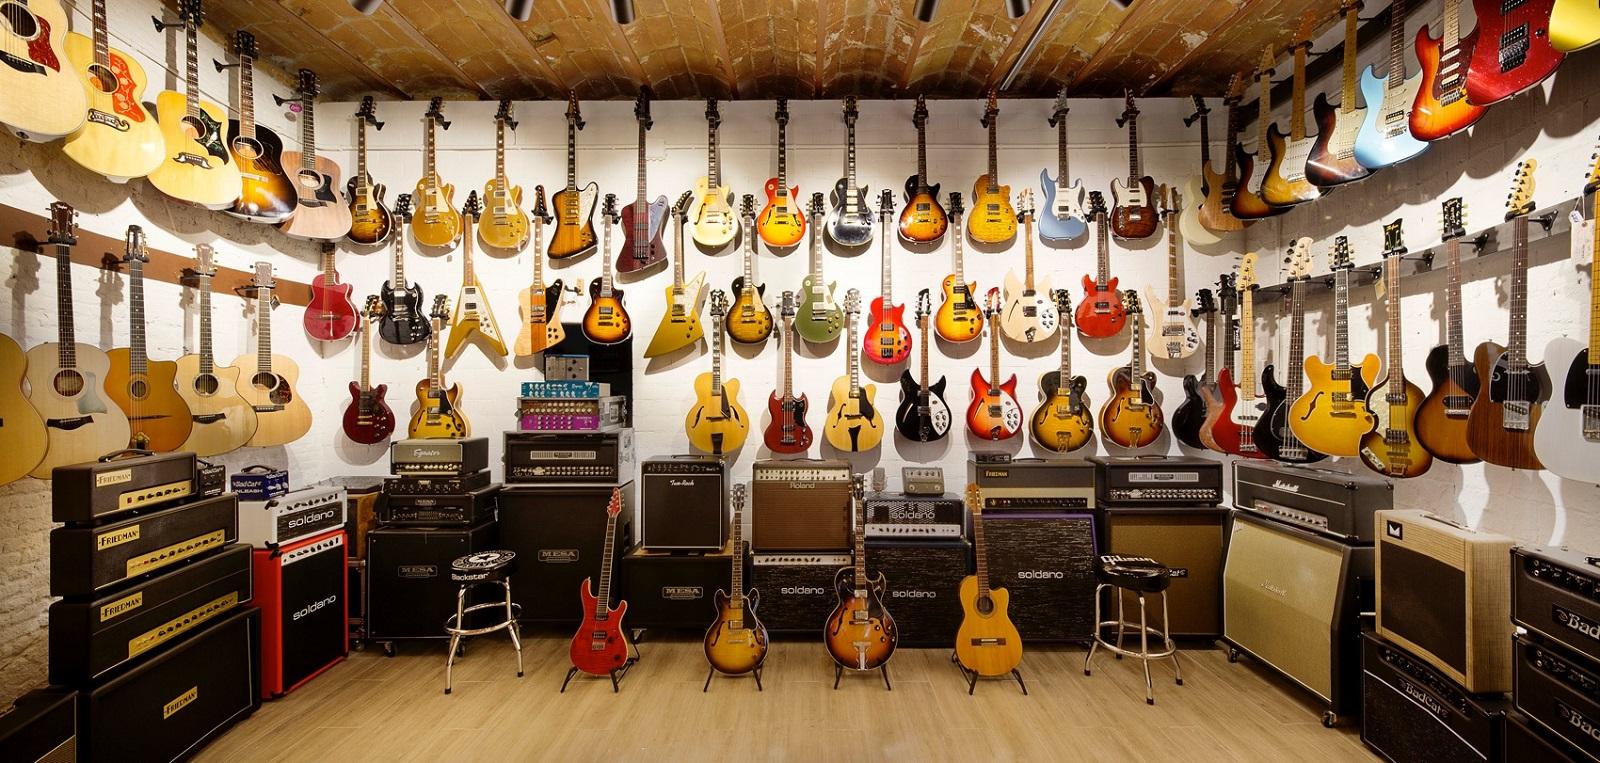 magasin de guitare achat et vente perpignan delmas musique. Black Bedroom Furniture Sets. Home Design Ideas